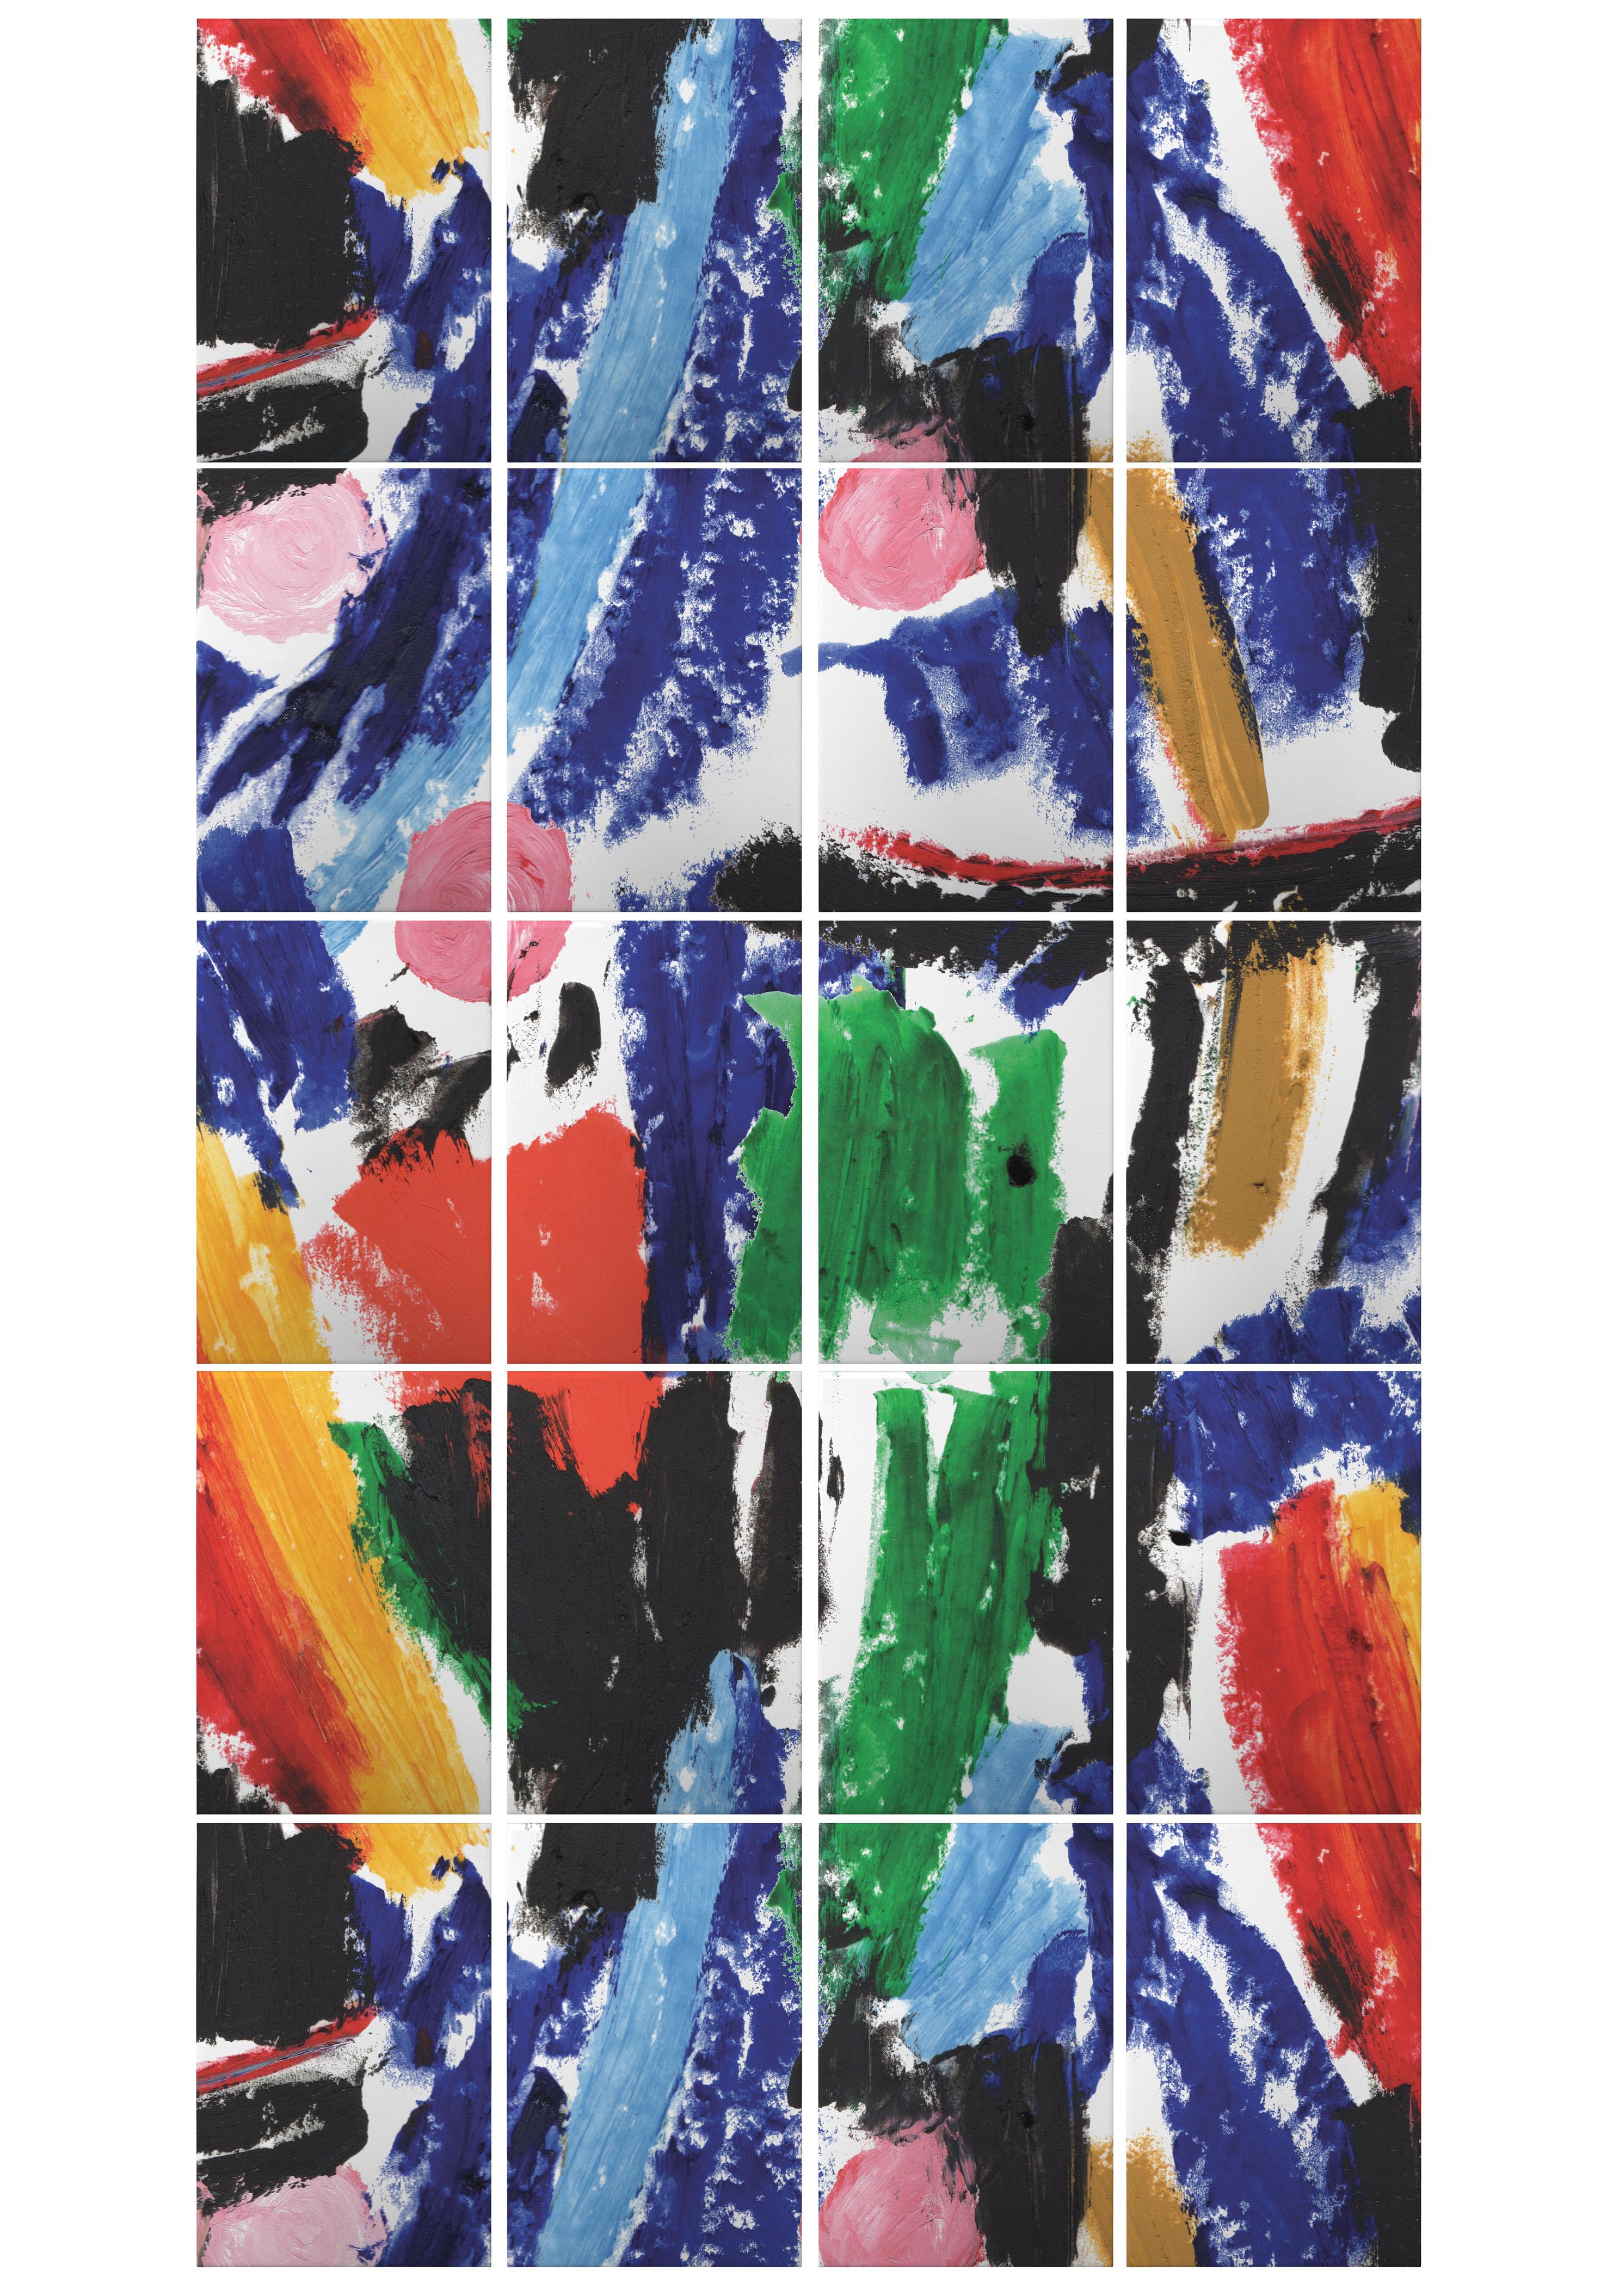 Tile Styling DanaFinnigan_1666187_LenteBluesRedLrgTiles.jpg